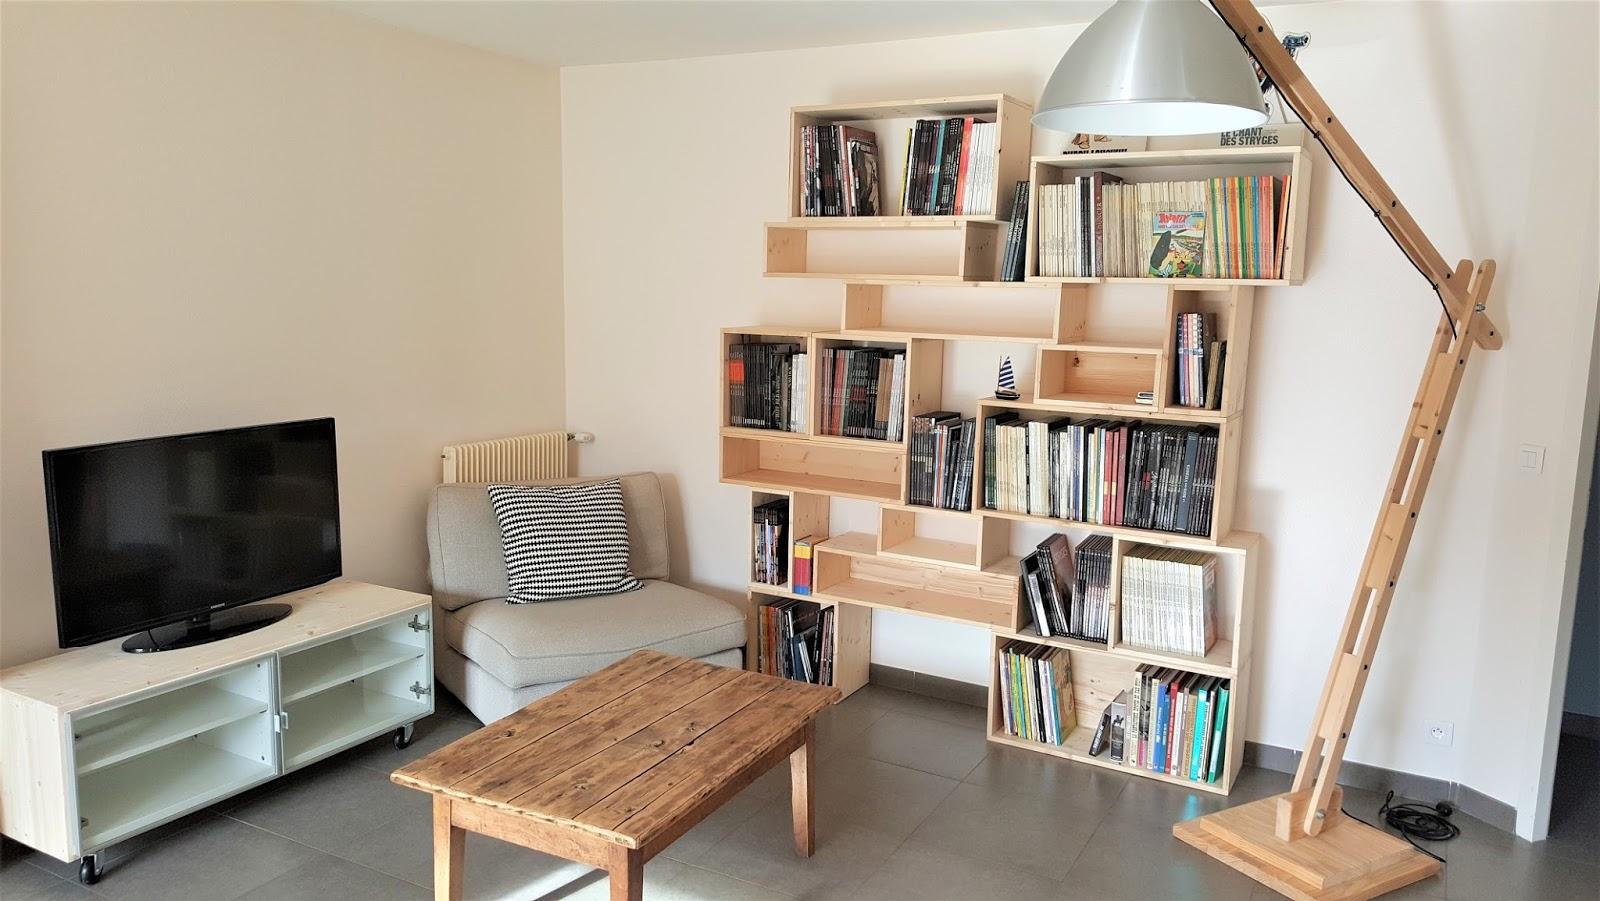 la maison des biblioth ques prix id es d coration id es d coration. Black Bedroom Furniture Sets. Home Design Ideas